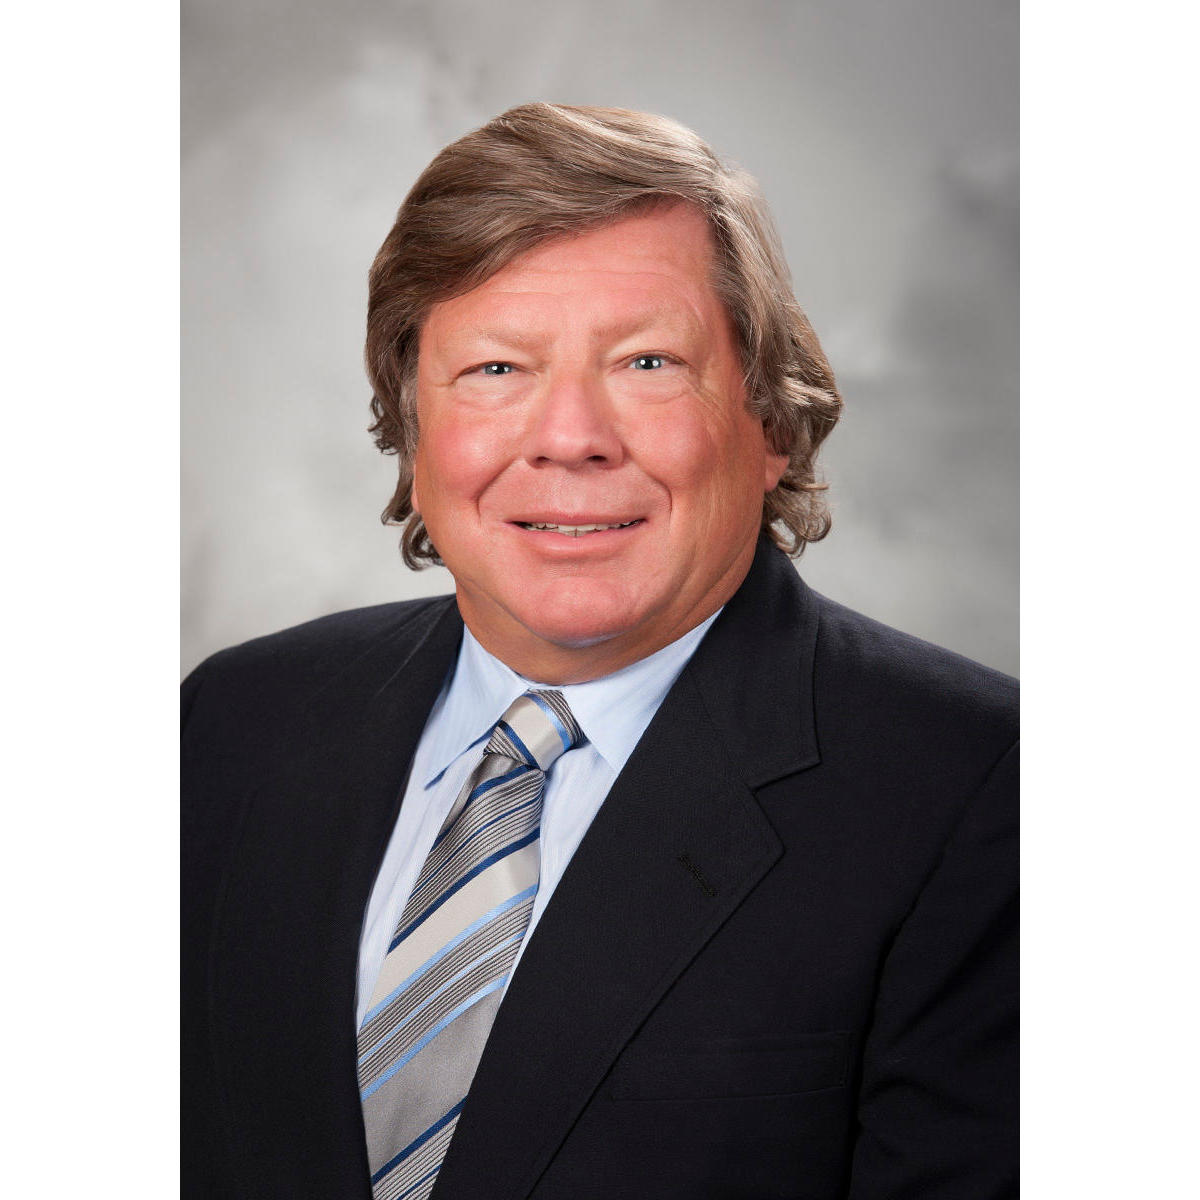 Robert J. Mazzeo, MD